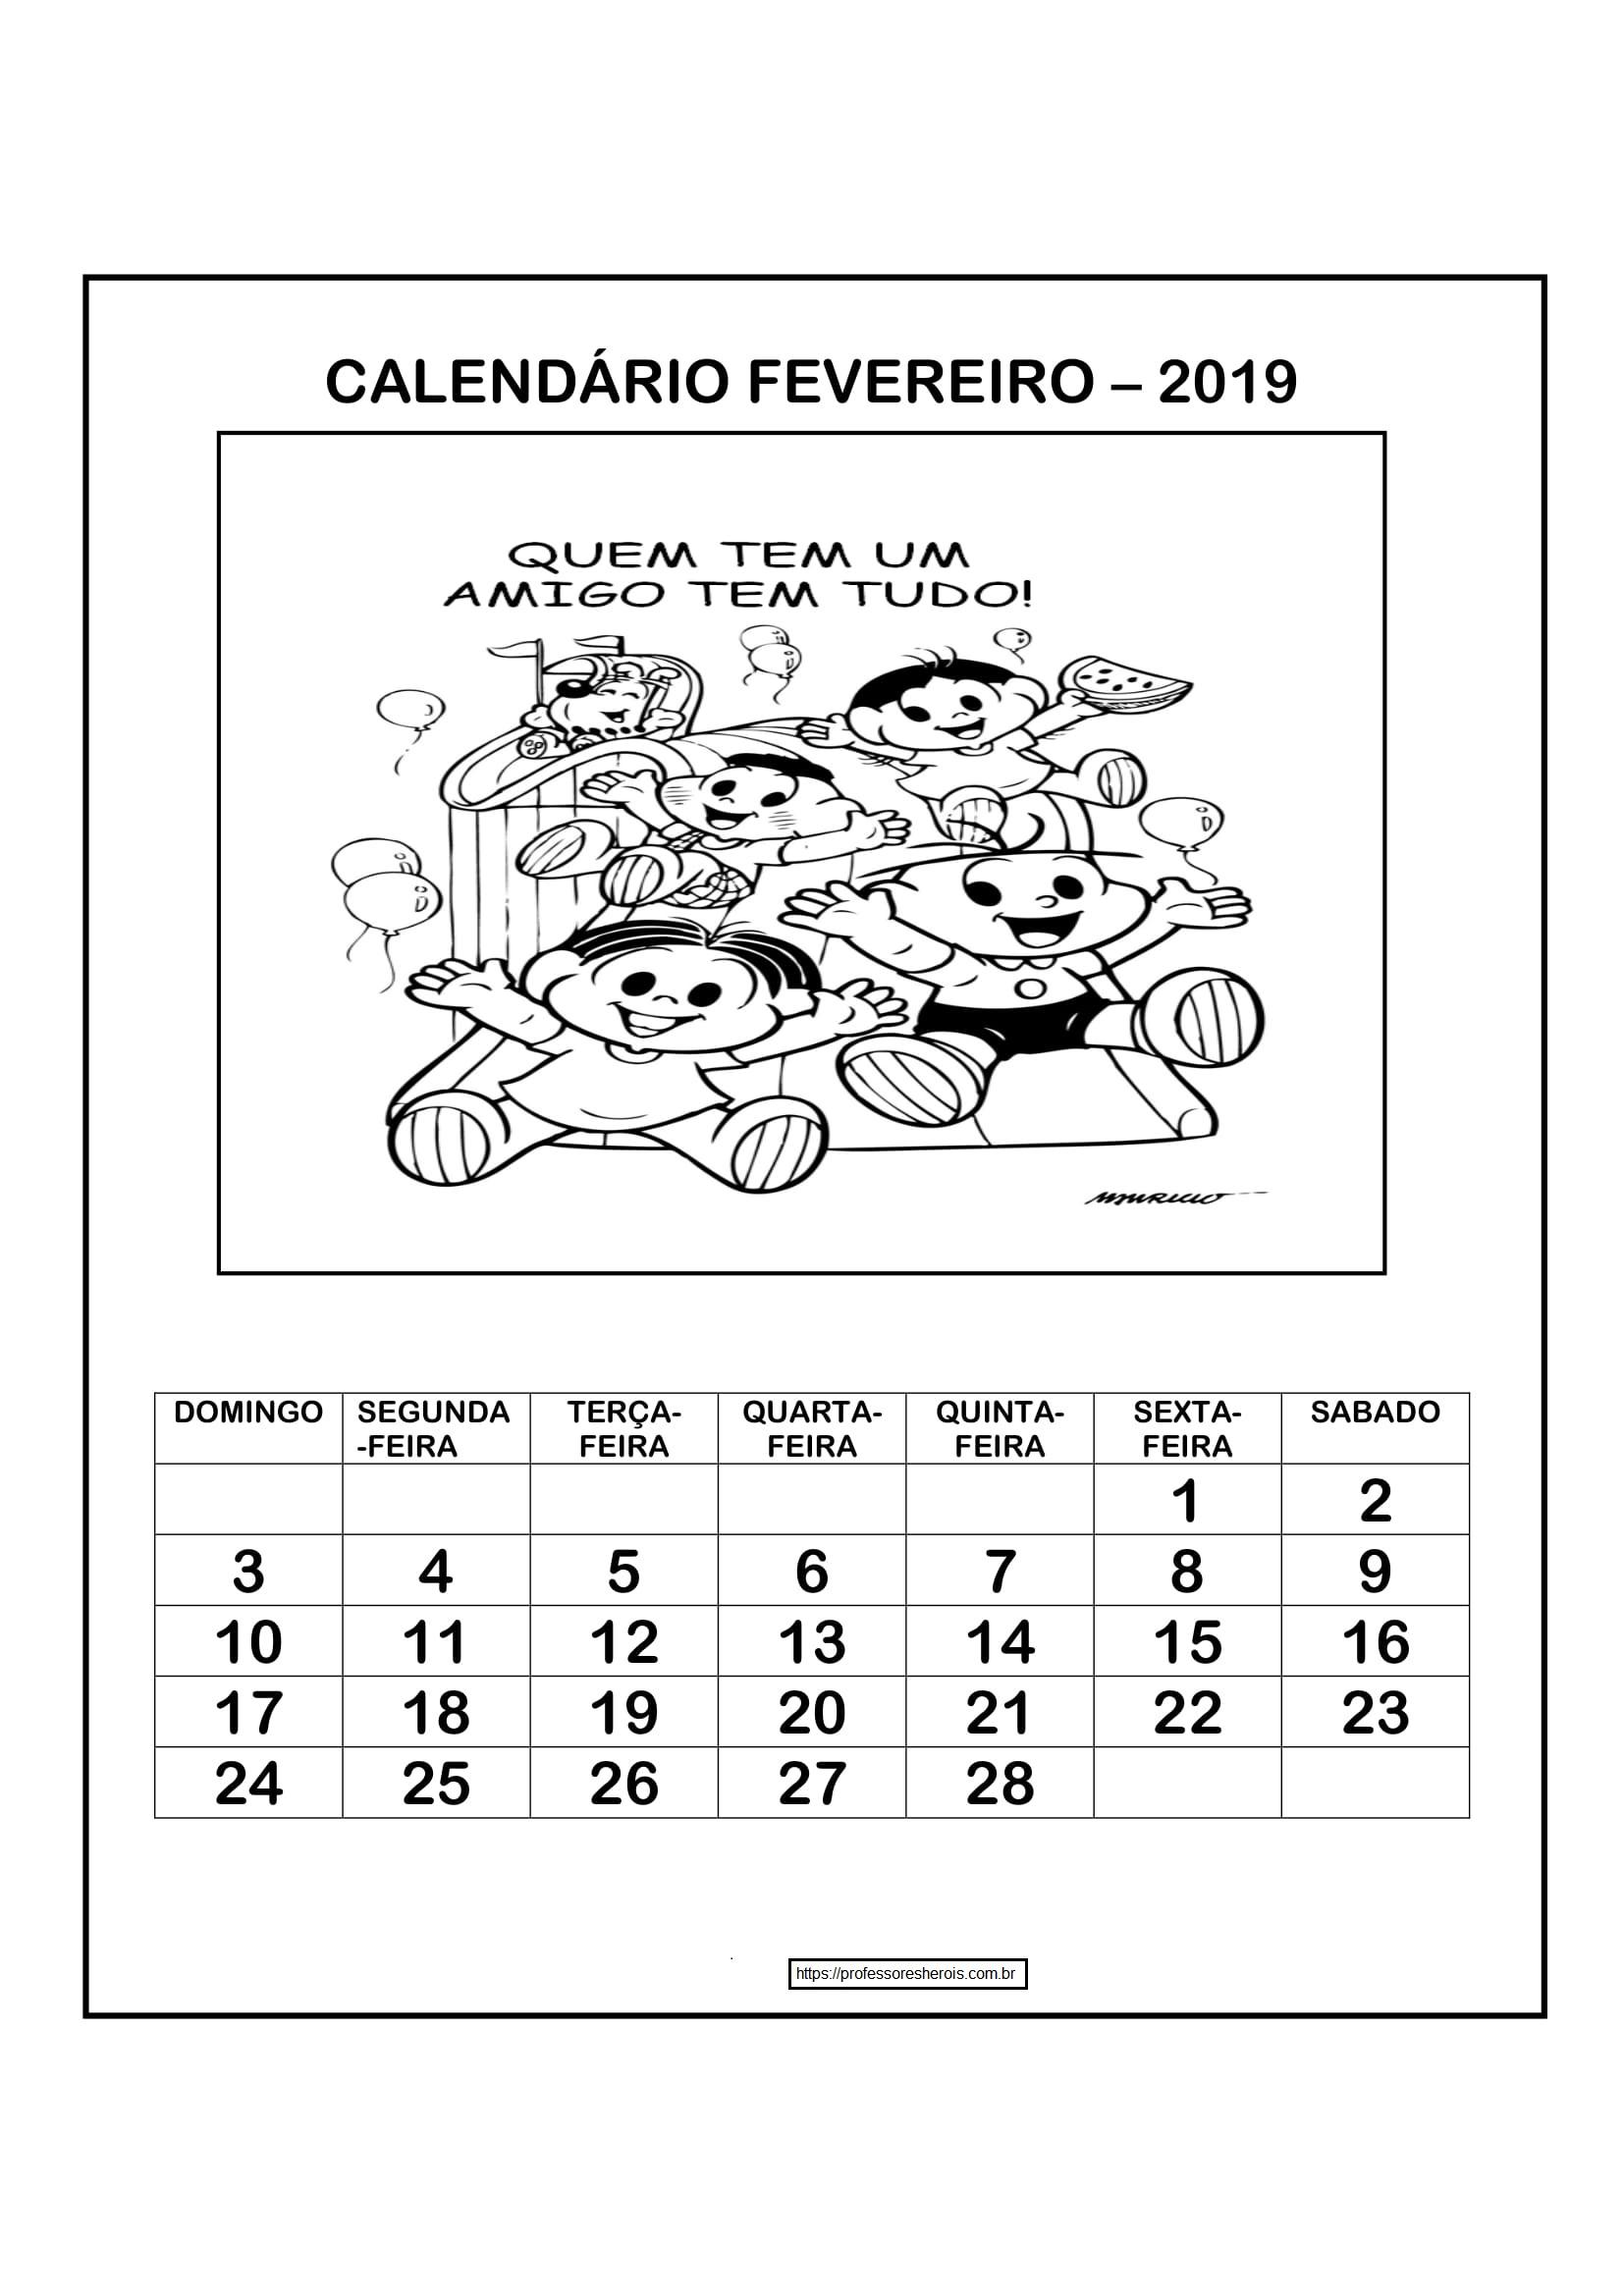 cadendario-para-completar-e-colorir-2019-fevereiro-D-1